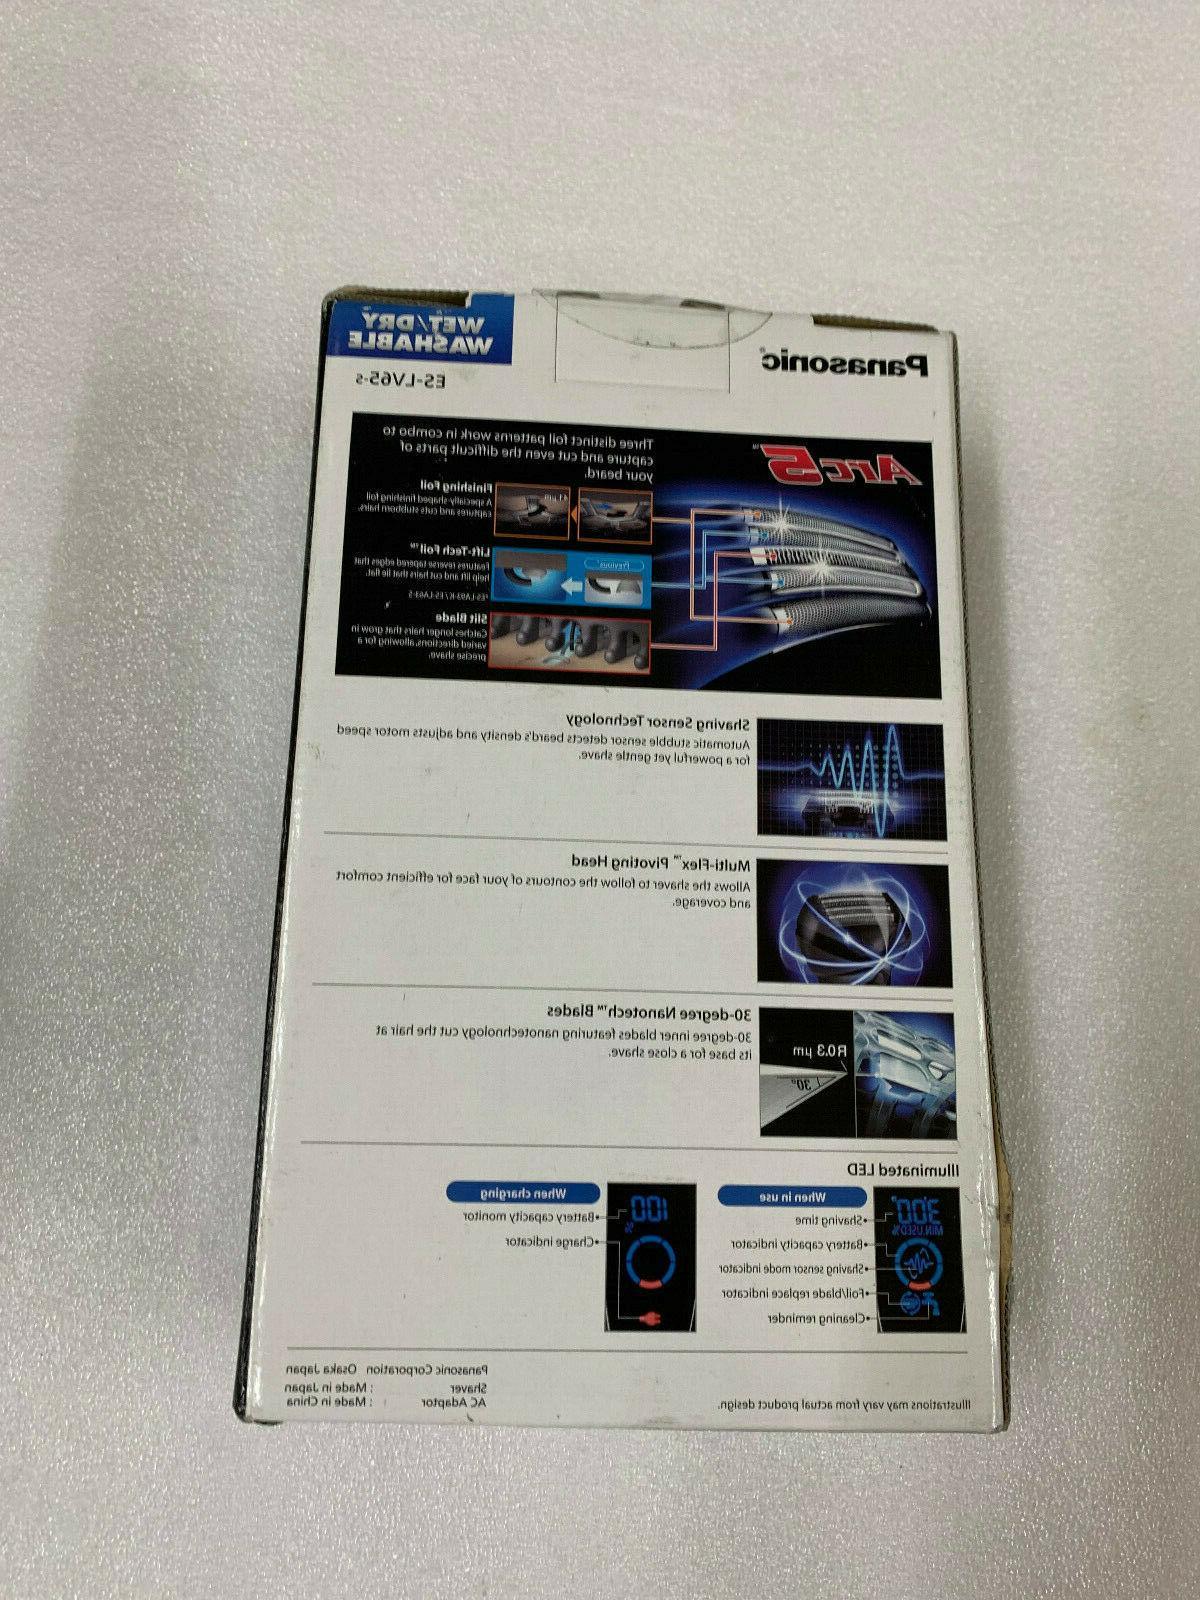 Panasonic Cordless Shave Electric Razor | ES-LV65-S